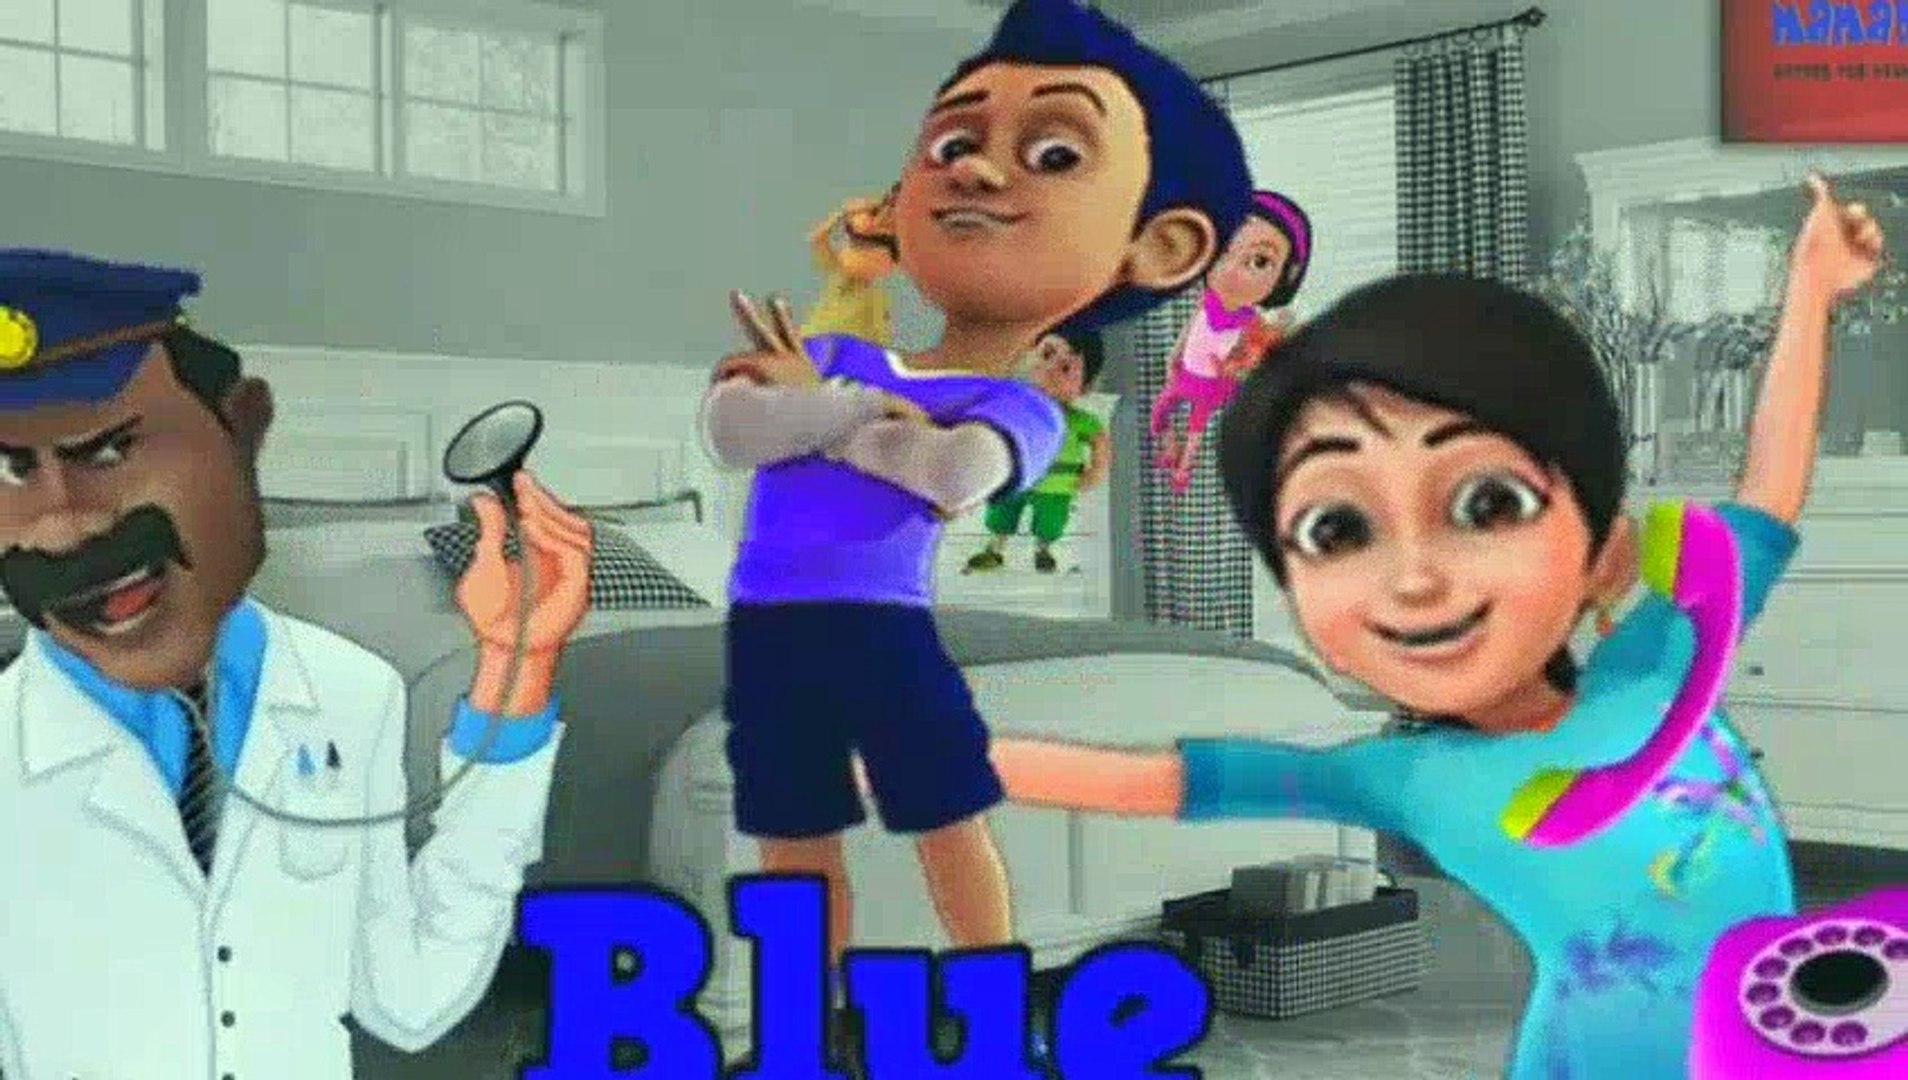 Shiva Cartoon TV Movie Cartoon For Kids, Tv series action comedy hd season 2019